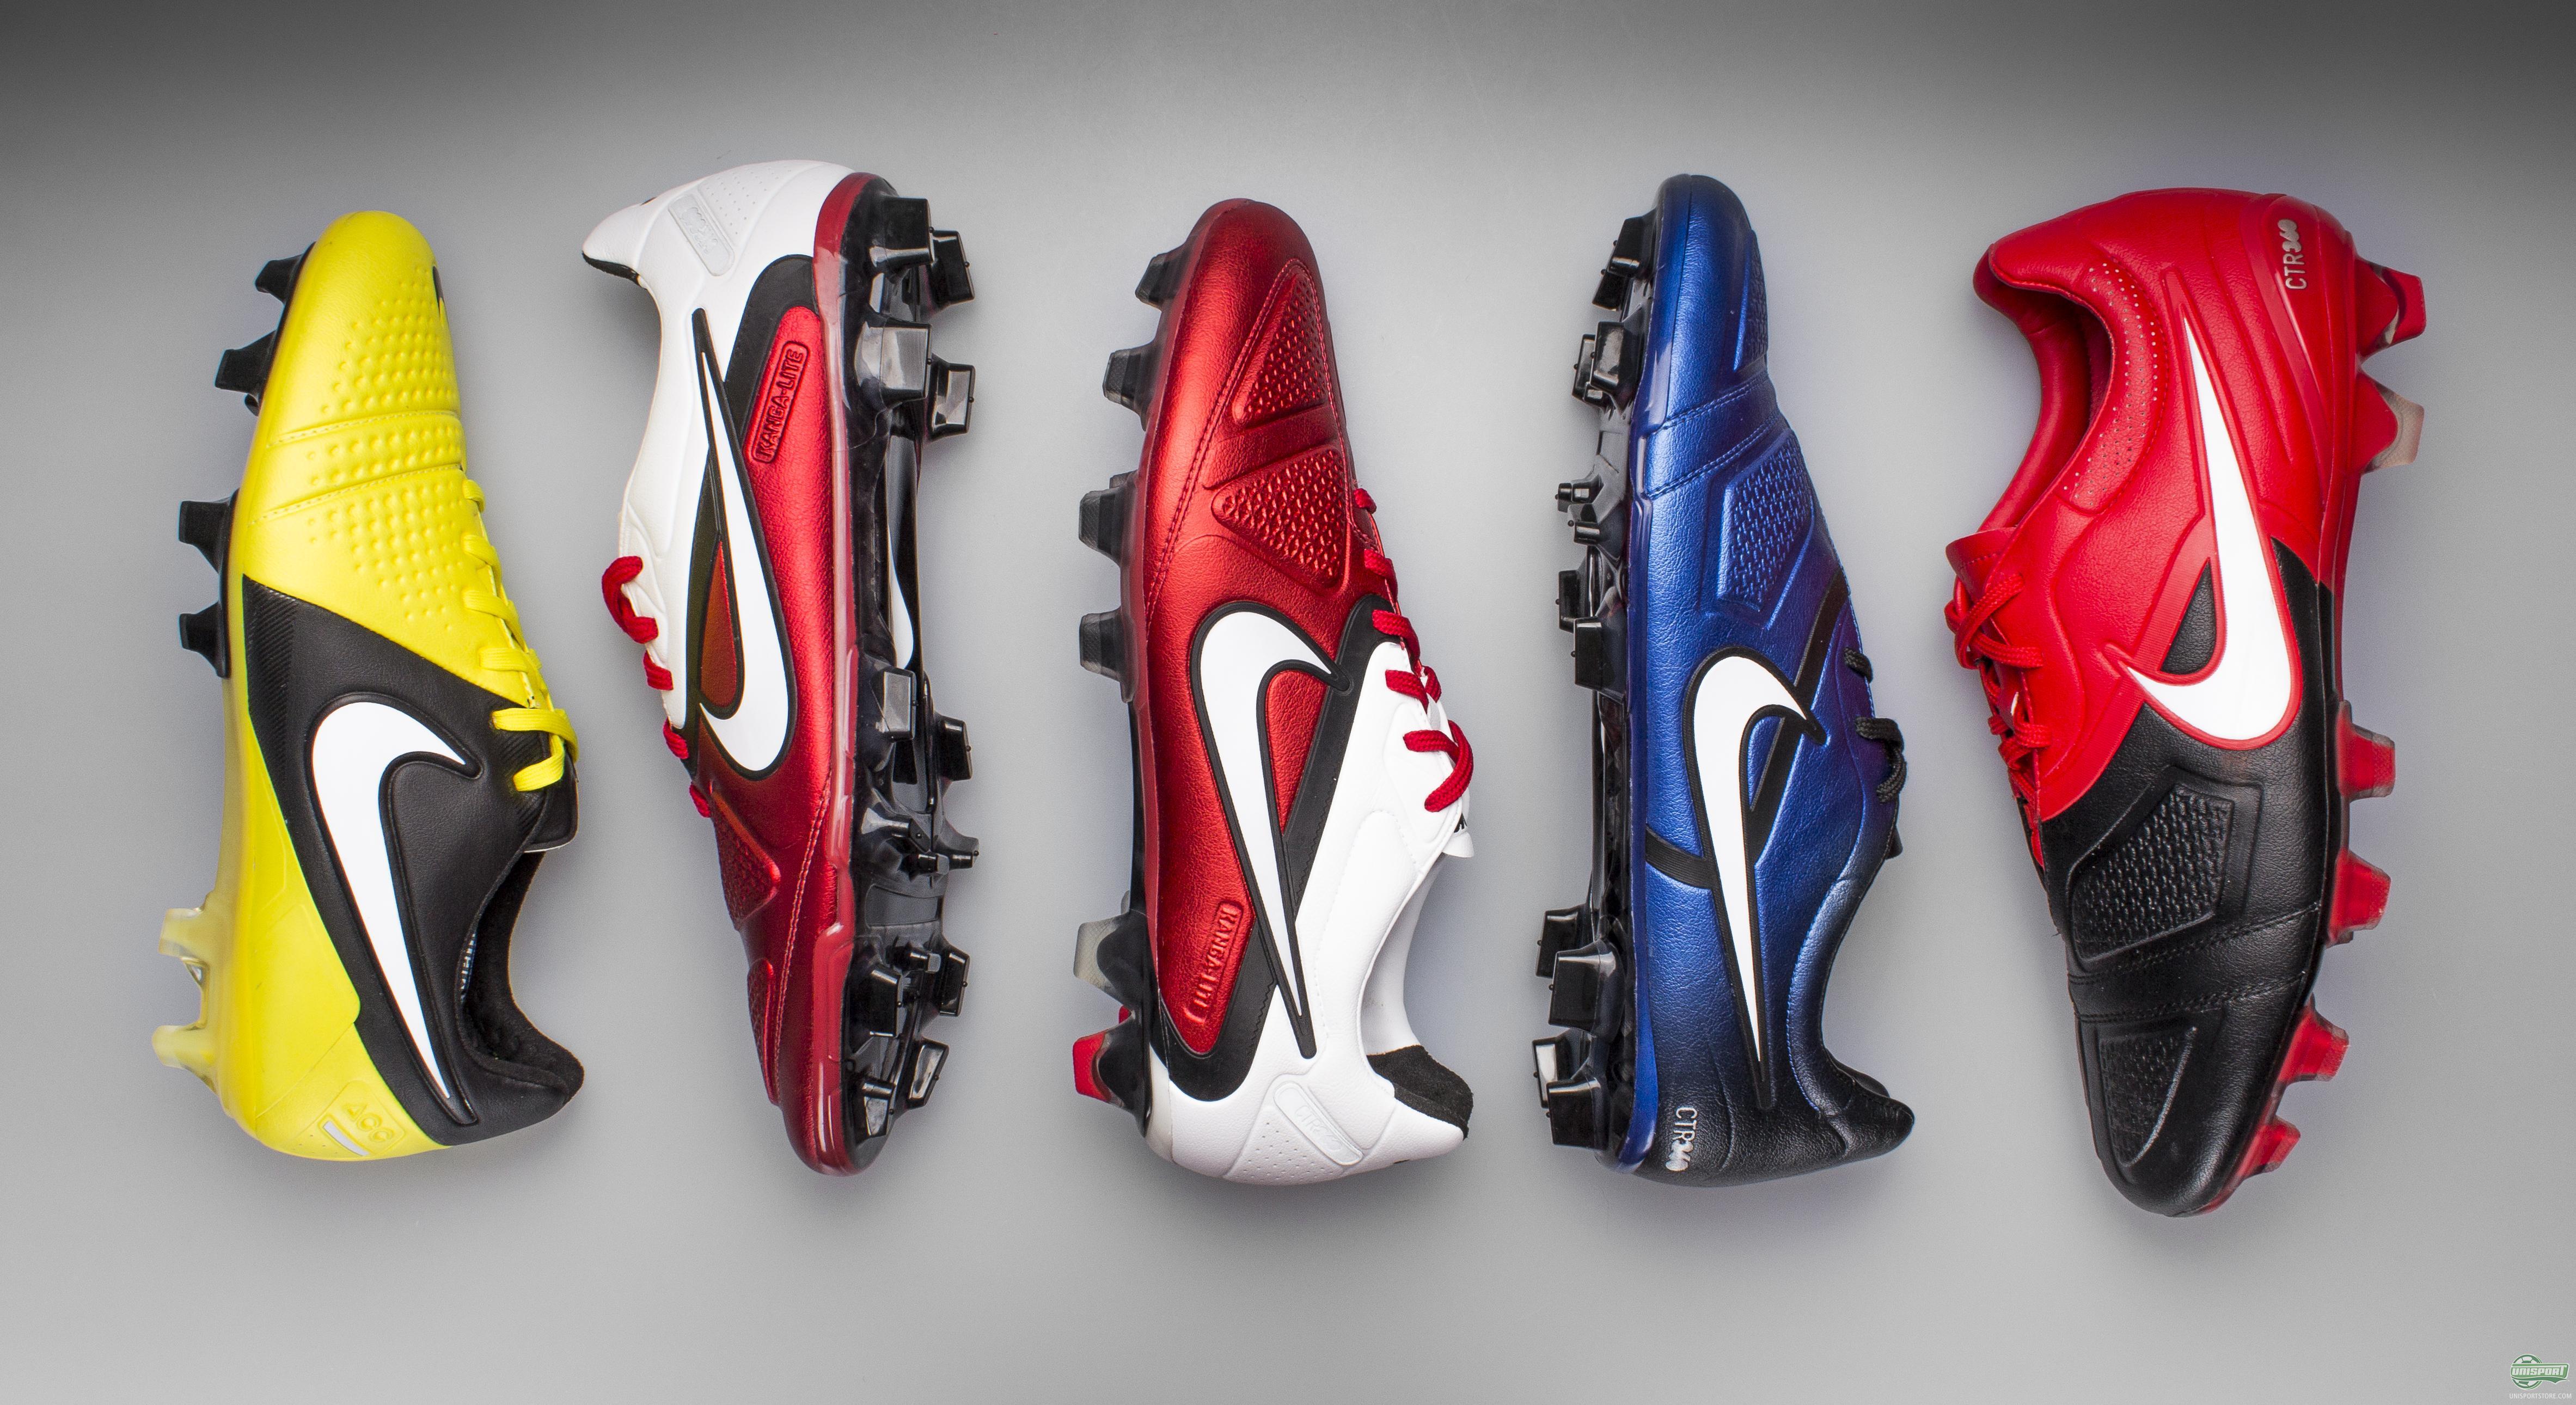 Nike CTR360 boots thus far